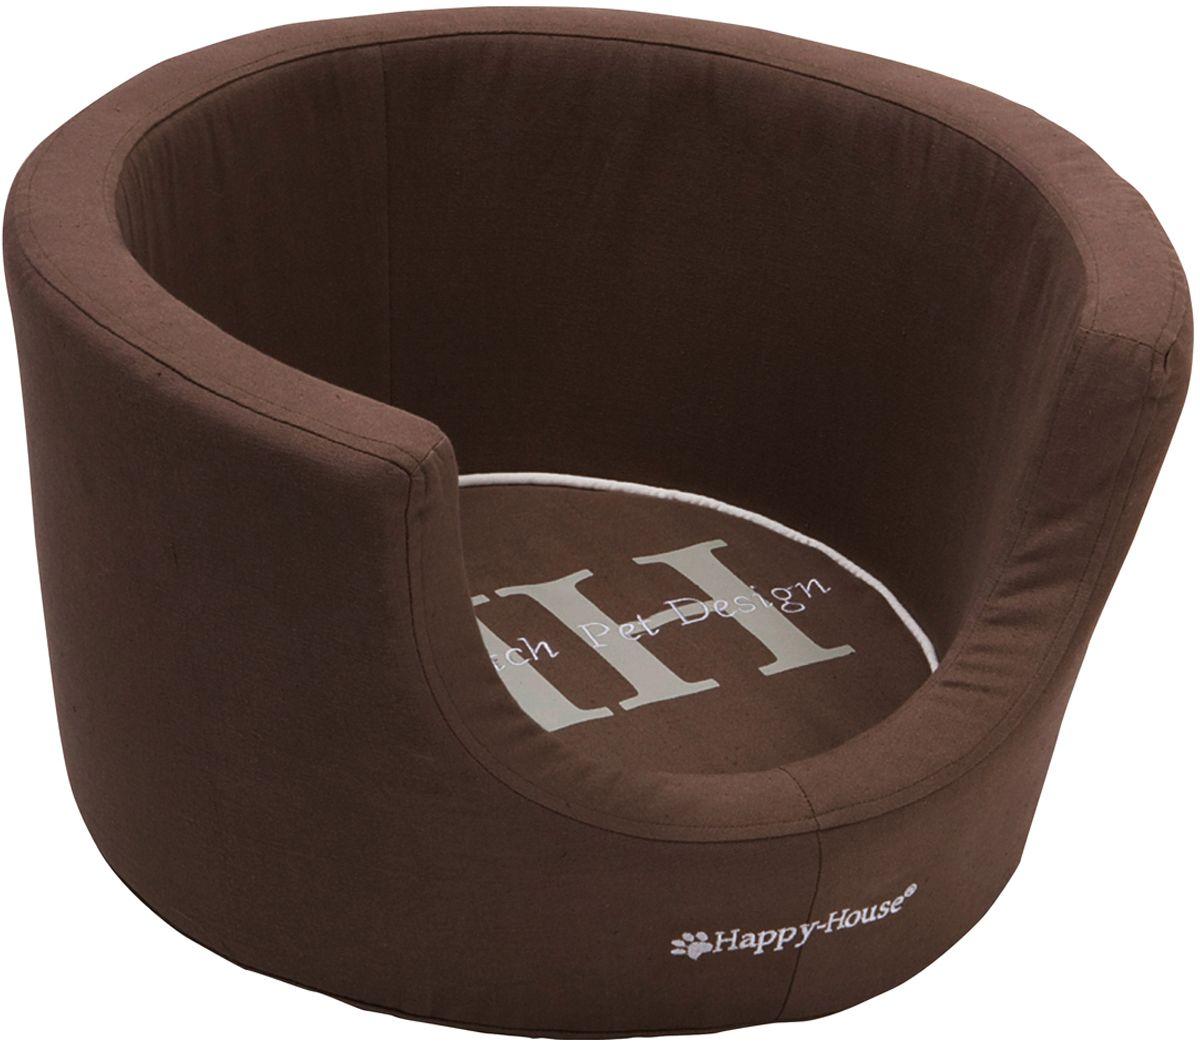 Лежак для животных Happy House Canvas Comfort, цвет: коричневый, 43 х 43 х 25 см